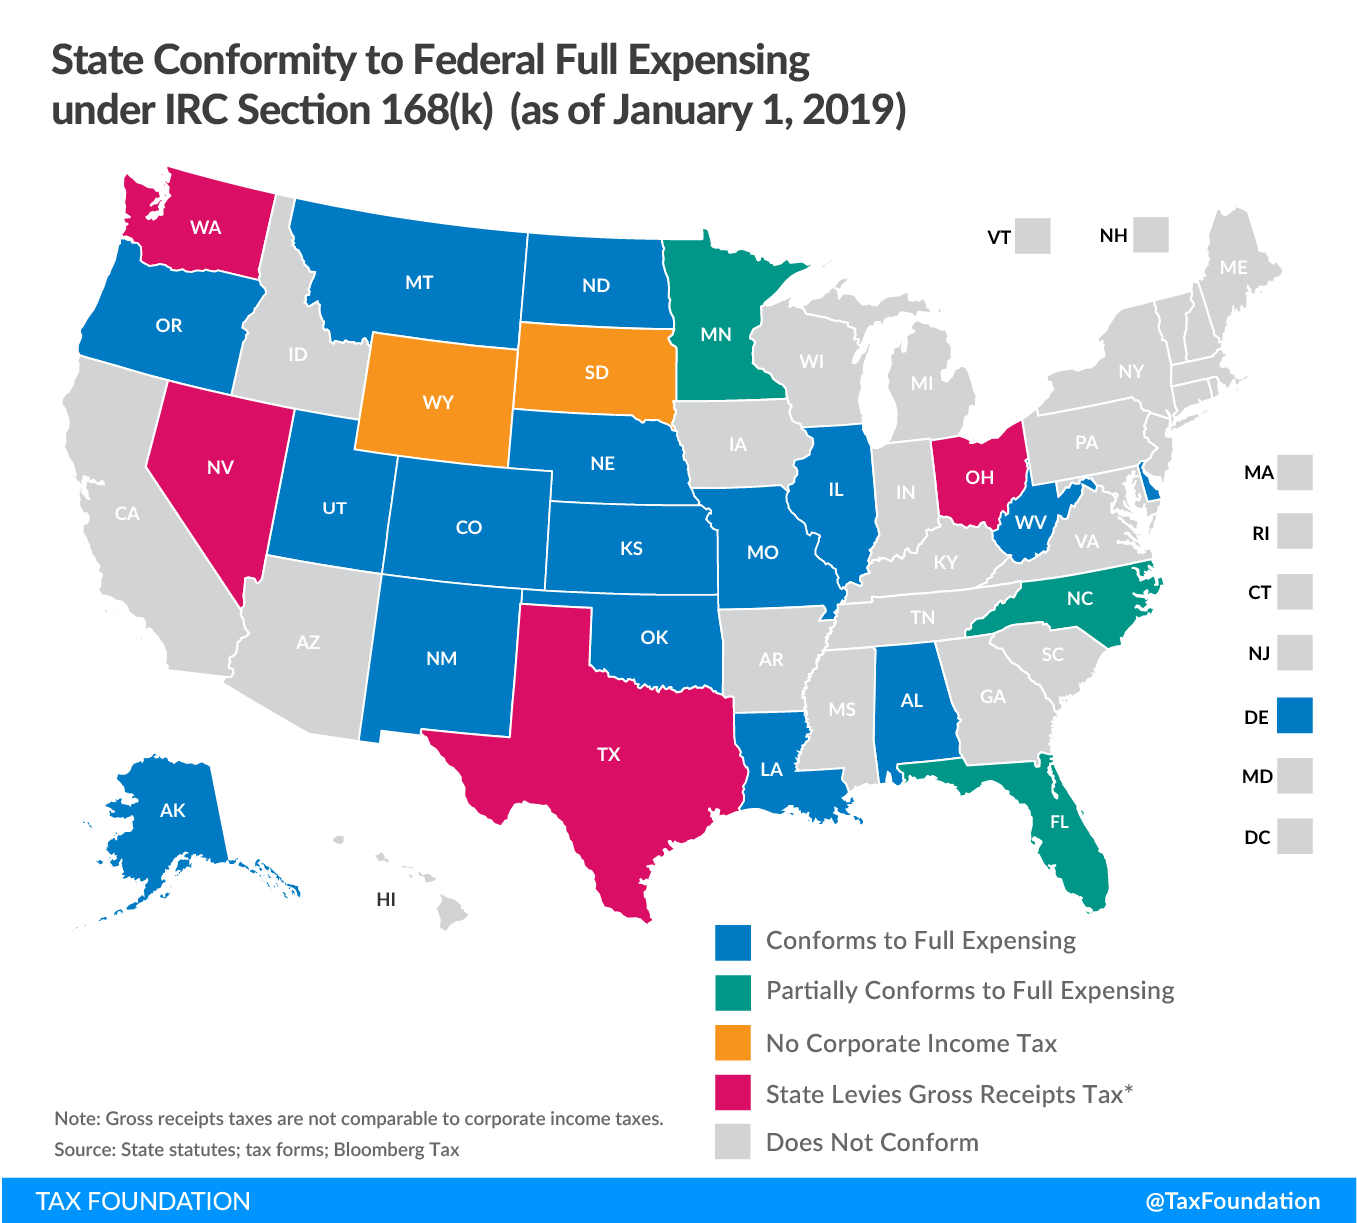 Wisconsin surplus revenue, Wisconsin revenue, Wisconsin tax cuts, Wisconsin state conformity, Wisconsin online sales tax